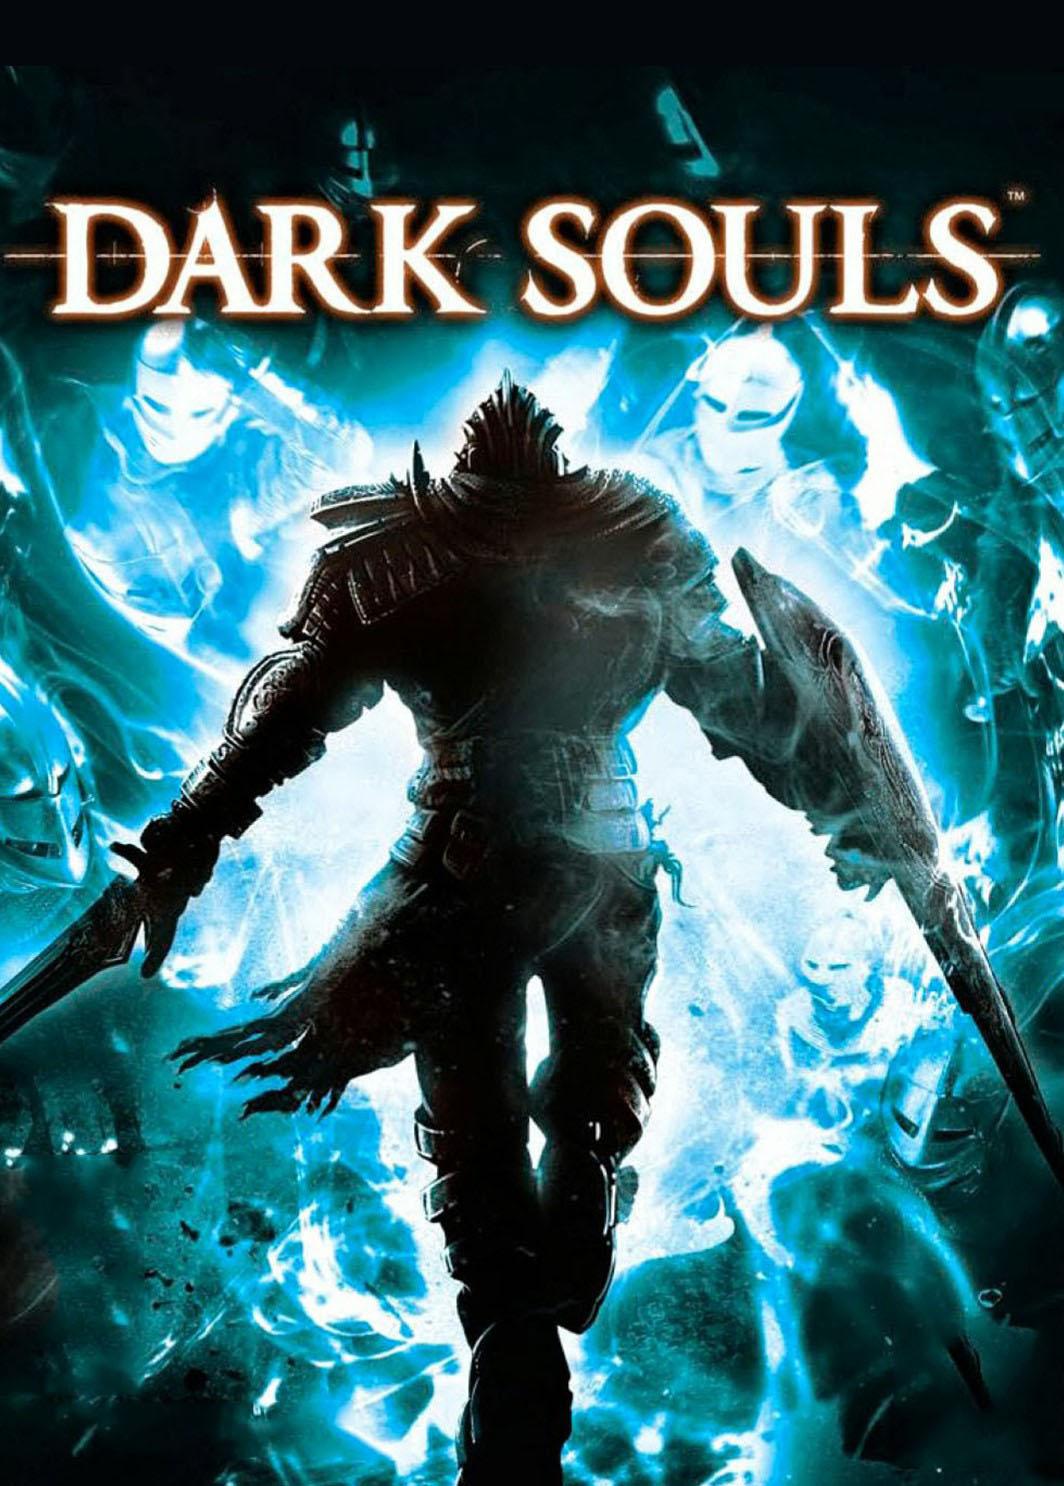 Dark souls 1 multiplayer